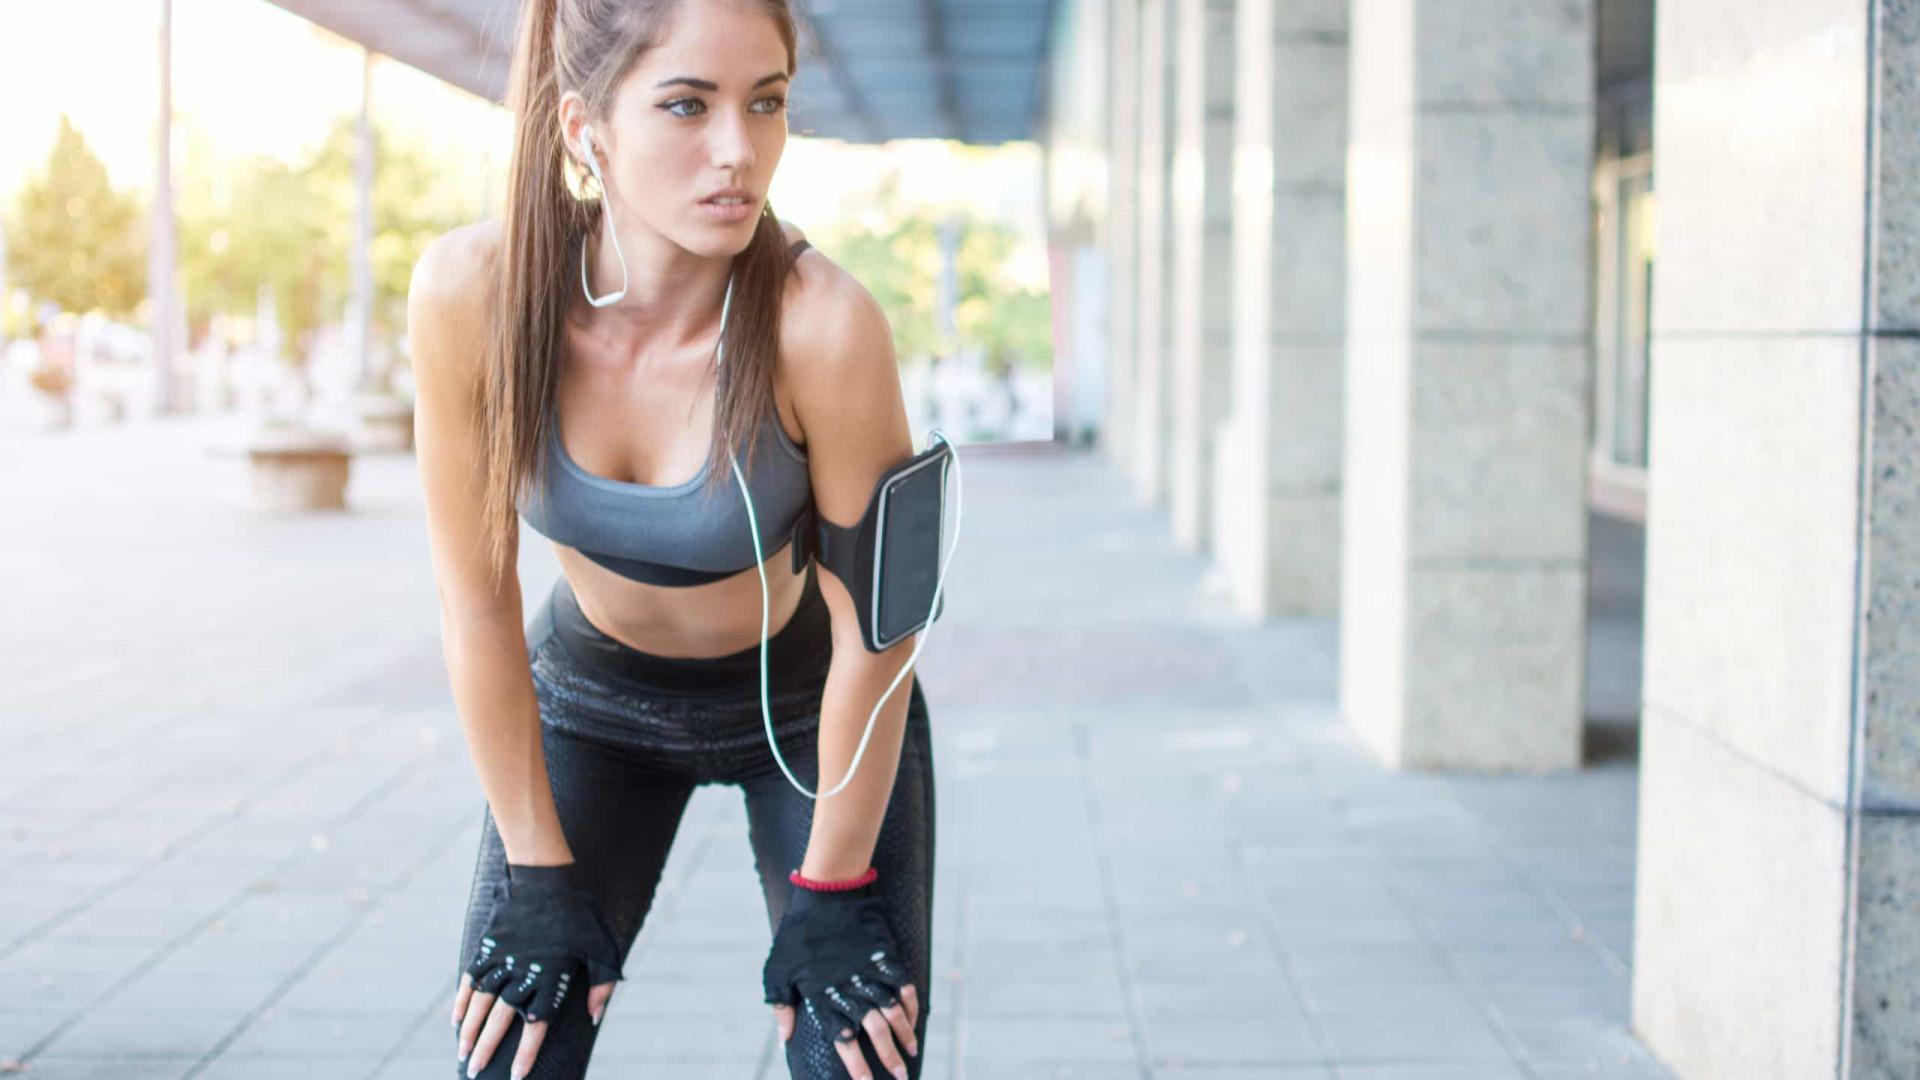 Cinco formas de retirar o cheiro de suor das roupas de treino